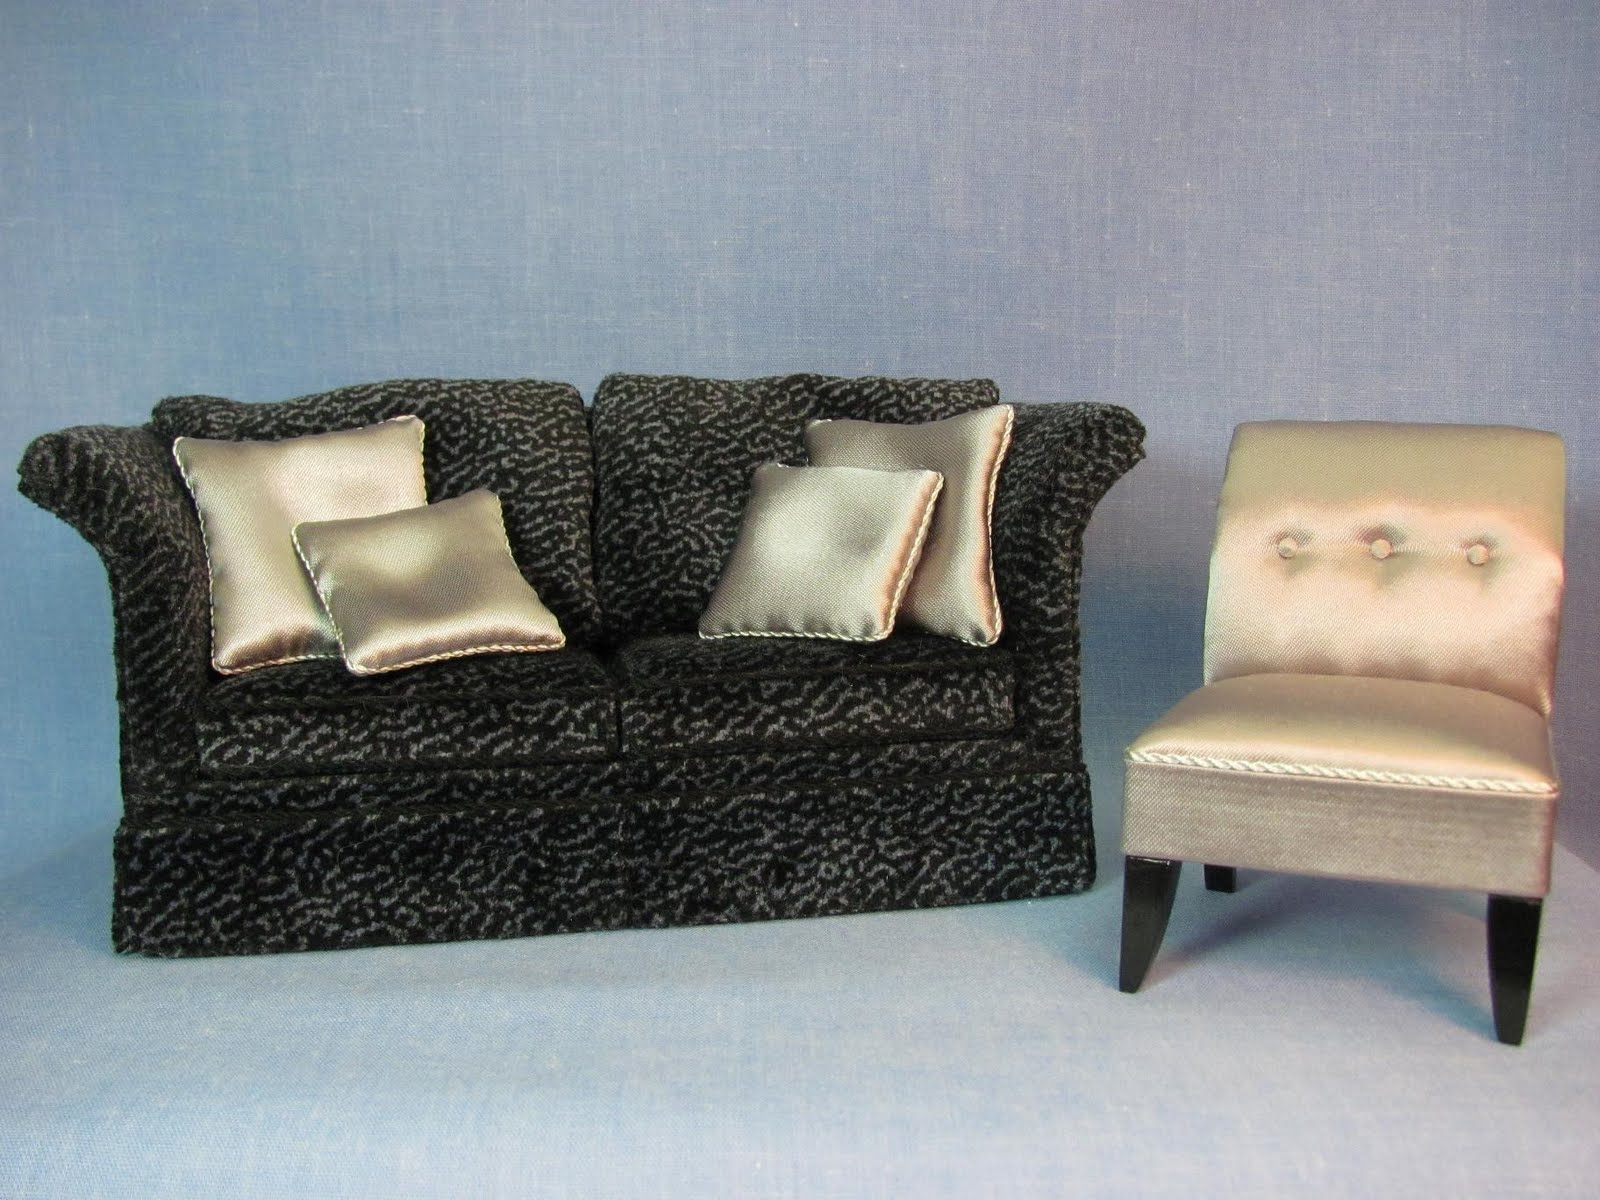 Dollhouse Sofa Full Sleeper Sale Miniature Furniture Tutorials 1 Inch Minis